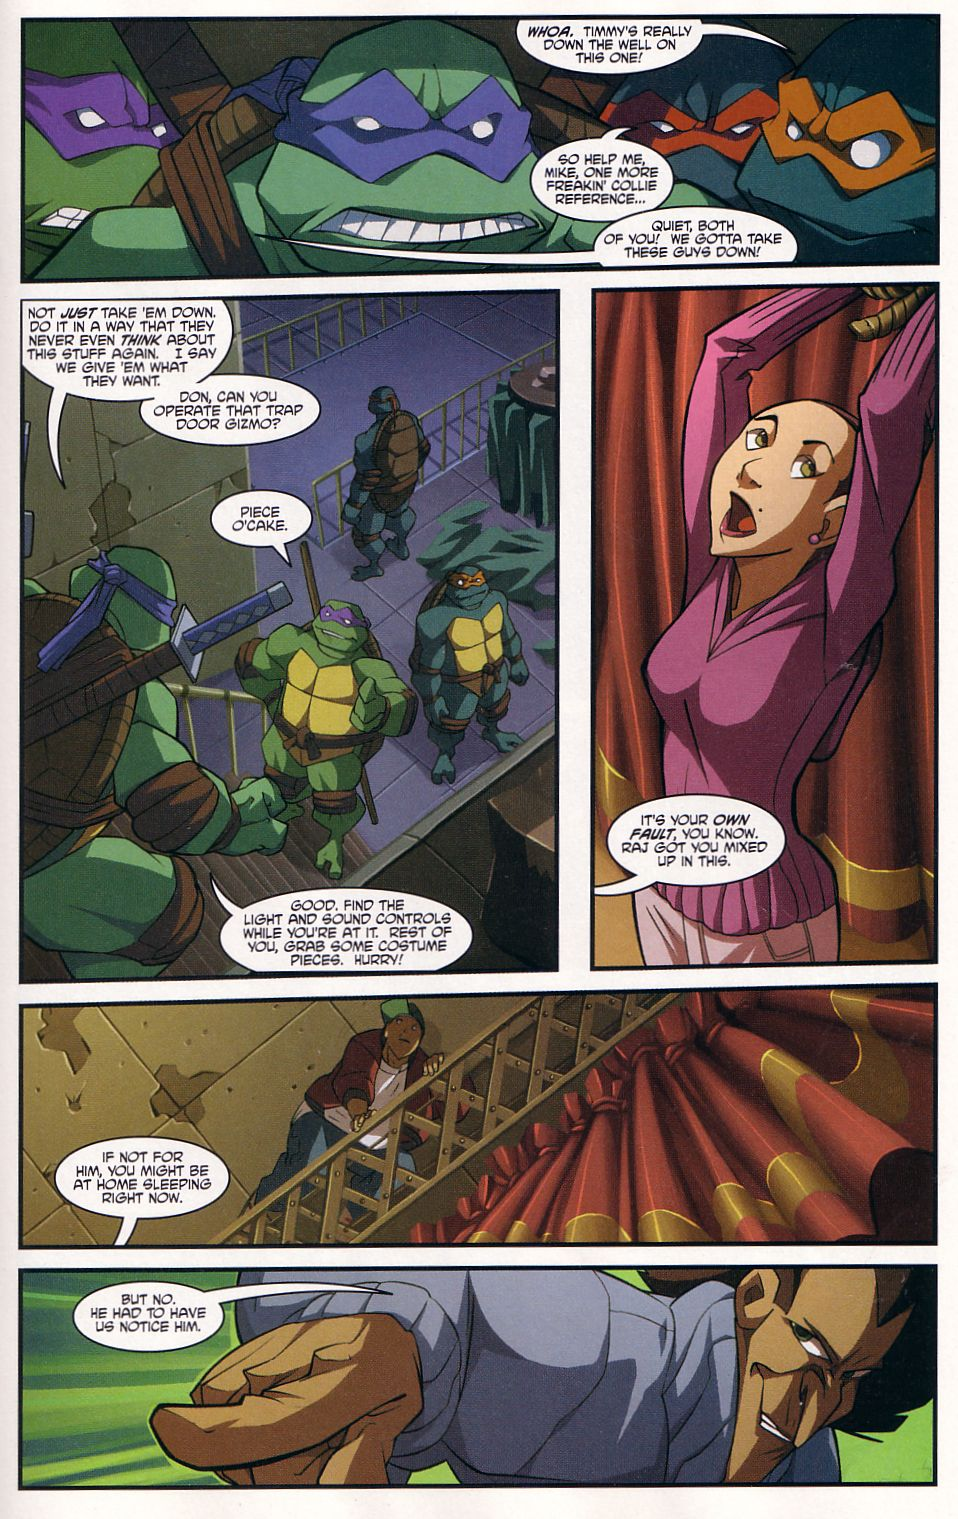 Teenage Mutant Ninja Turtles (2003) chap 7 pic 17